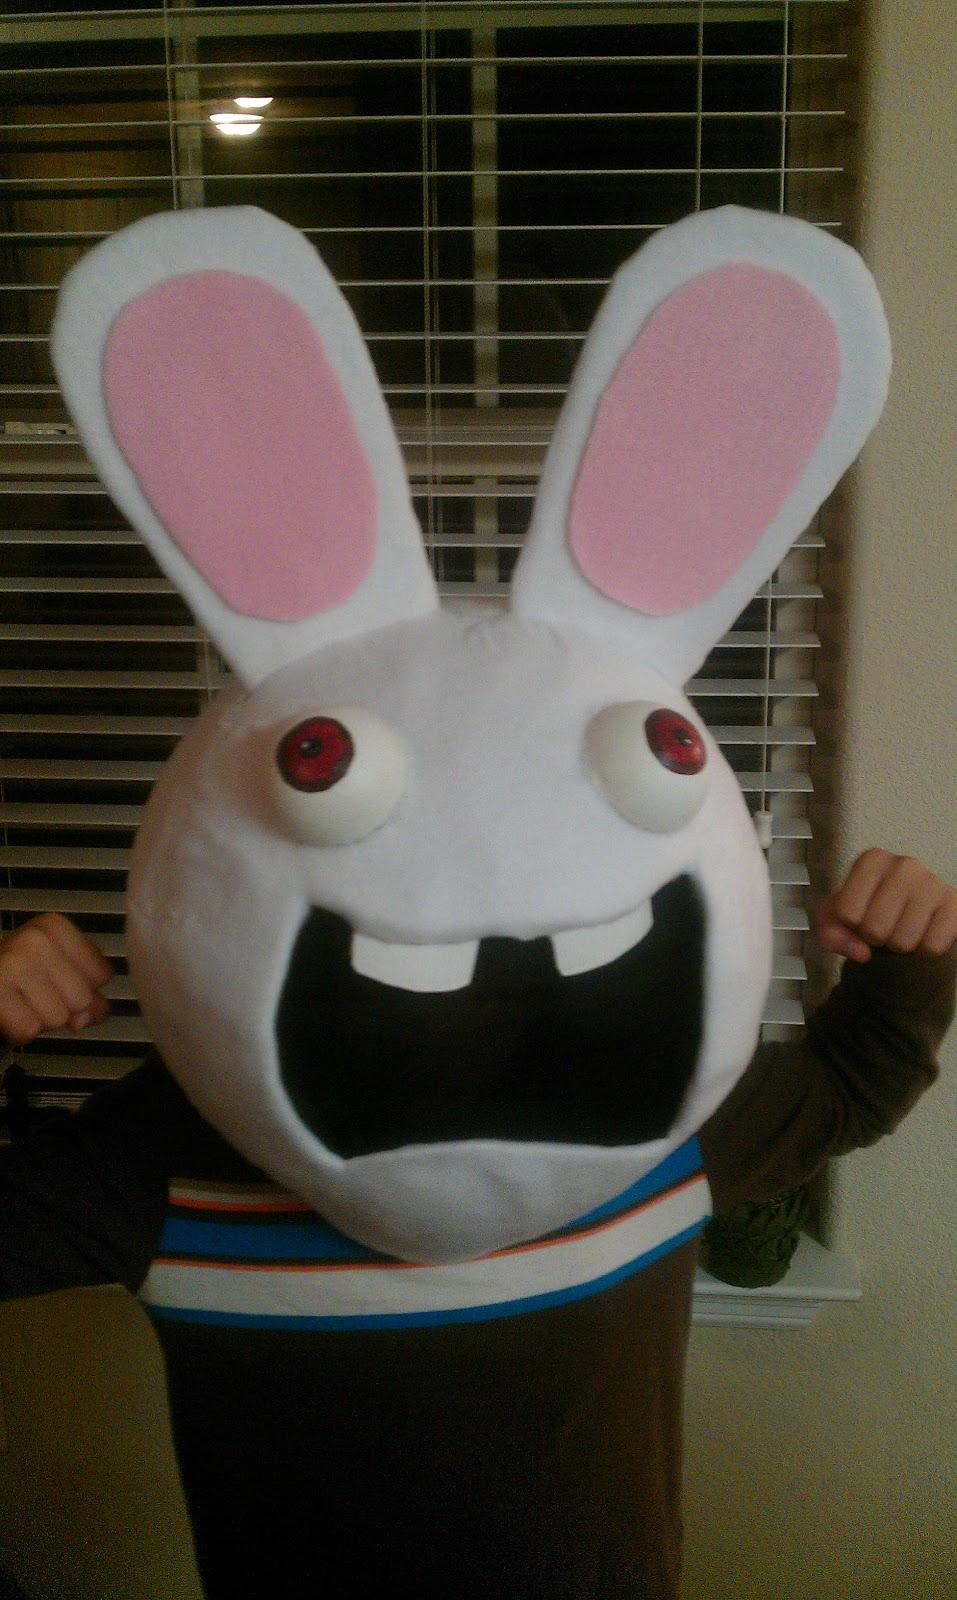 Spray Paint Mask >> MoonRuffle: The boychilds Raving Rabbid Costume